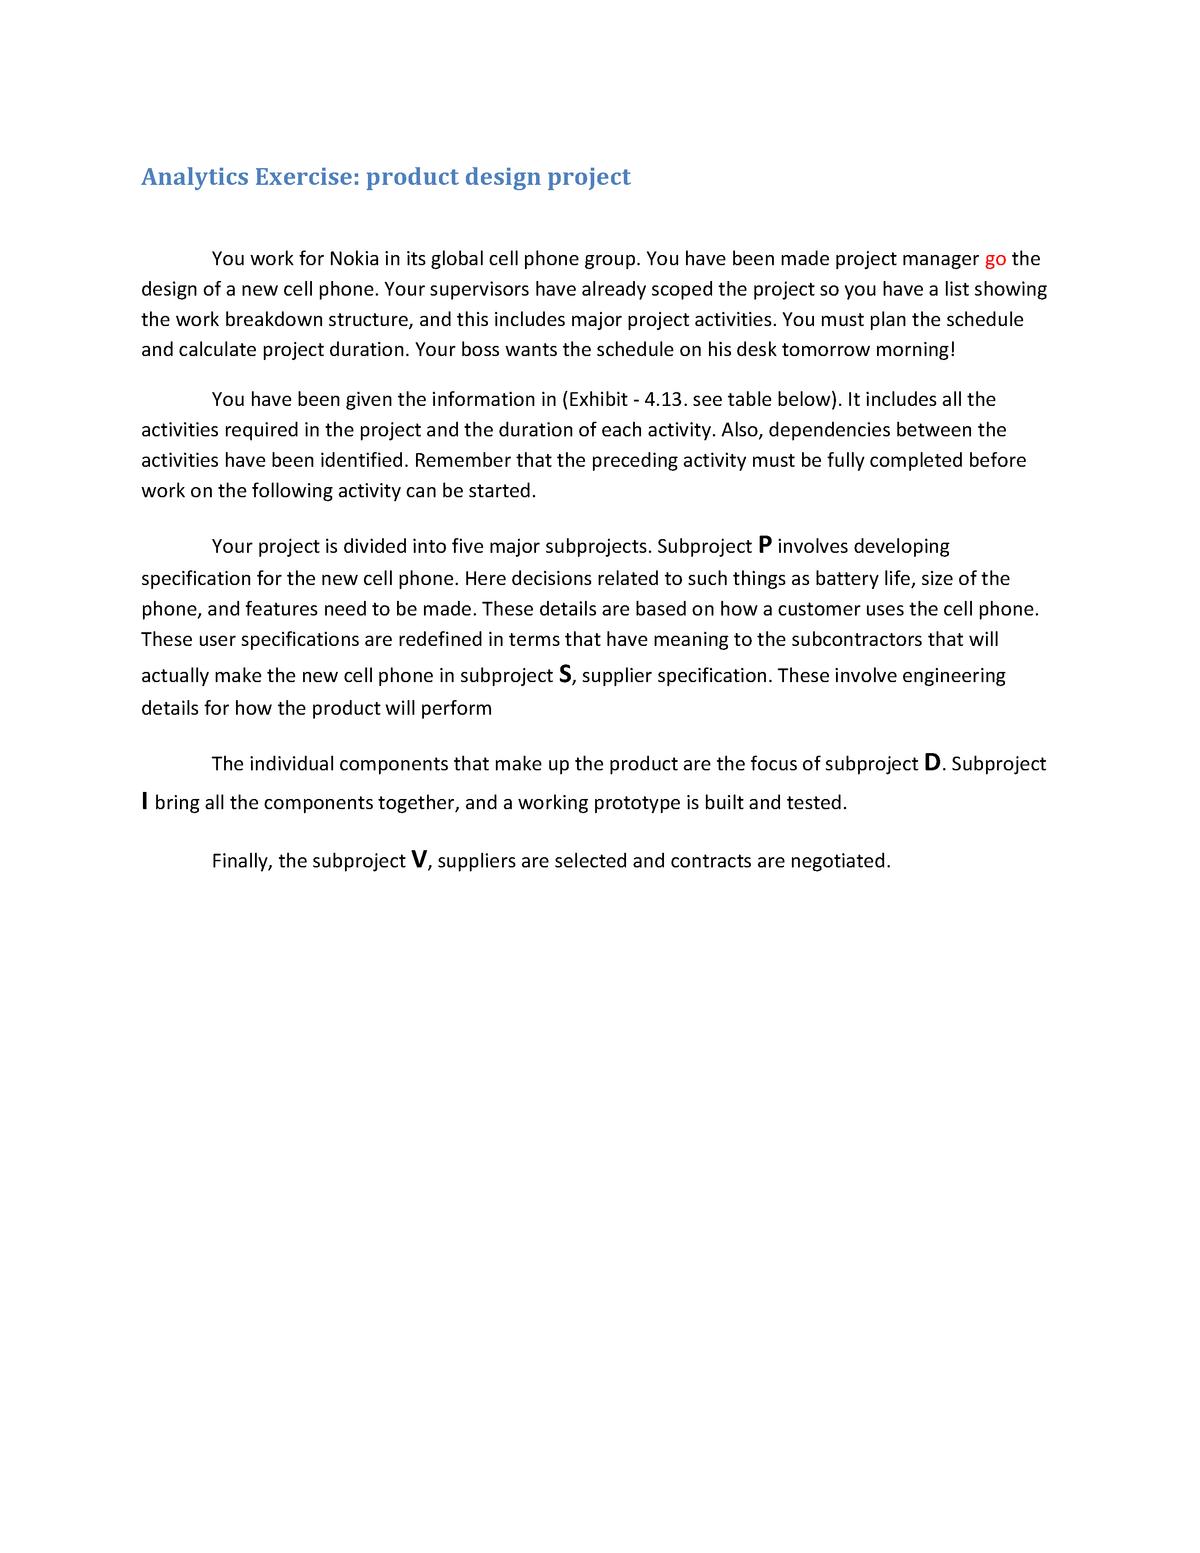 OSCM-2121- Case Study-Chapter 4-Analytics Exercise-2018